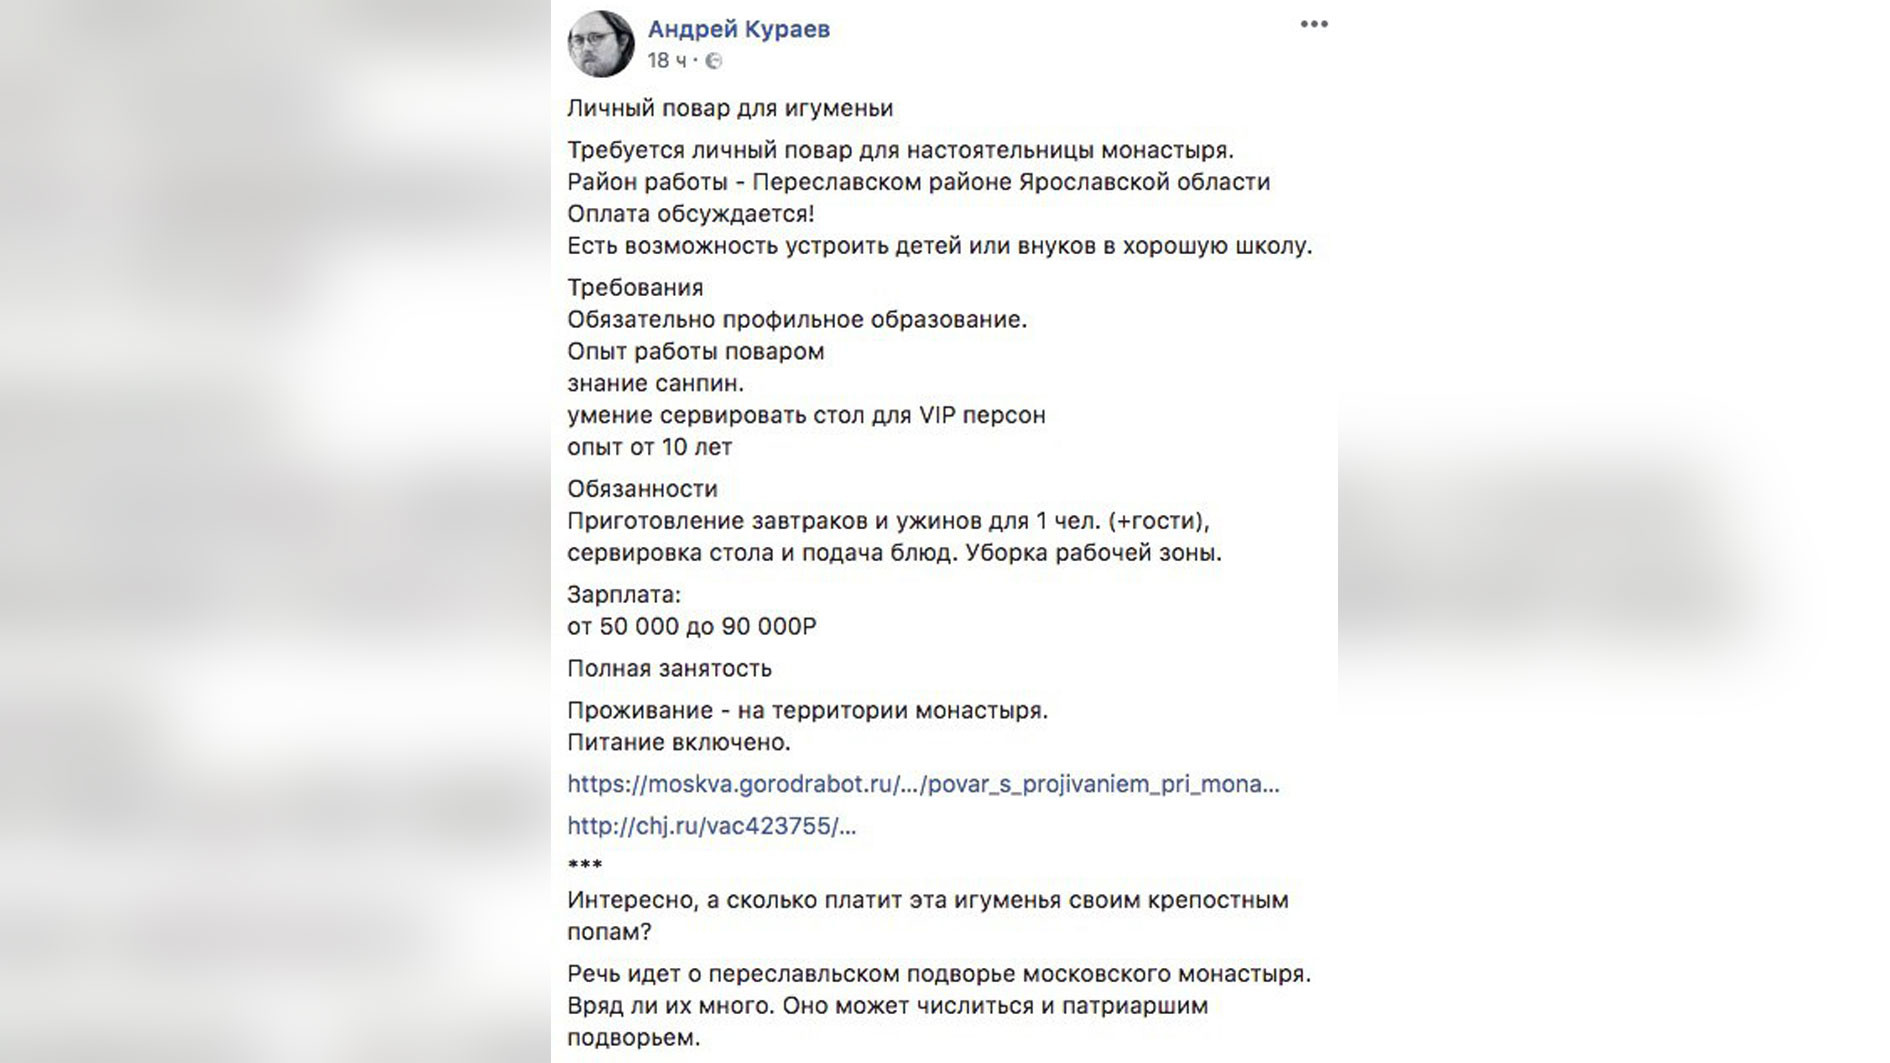 Фото: © Facebook.com/diak.kuraev